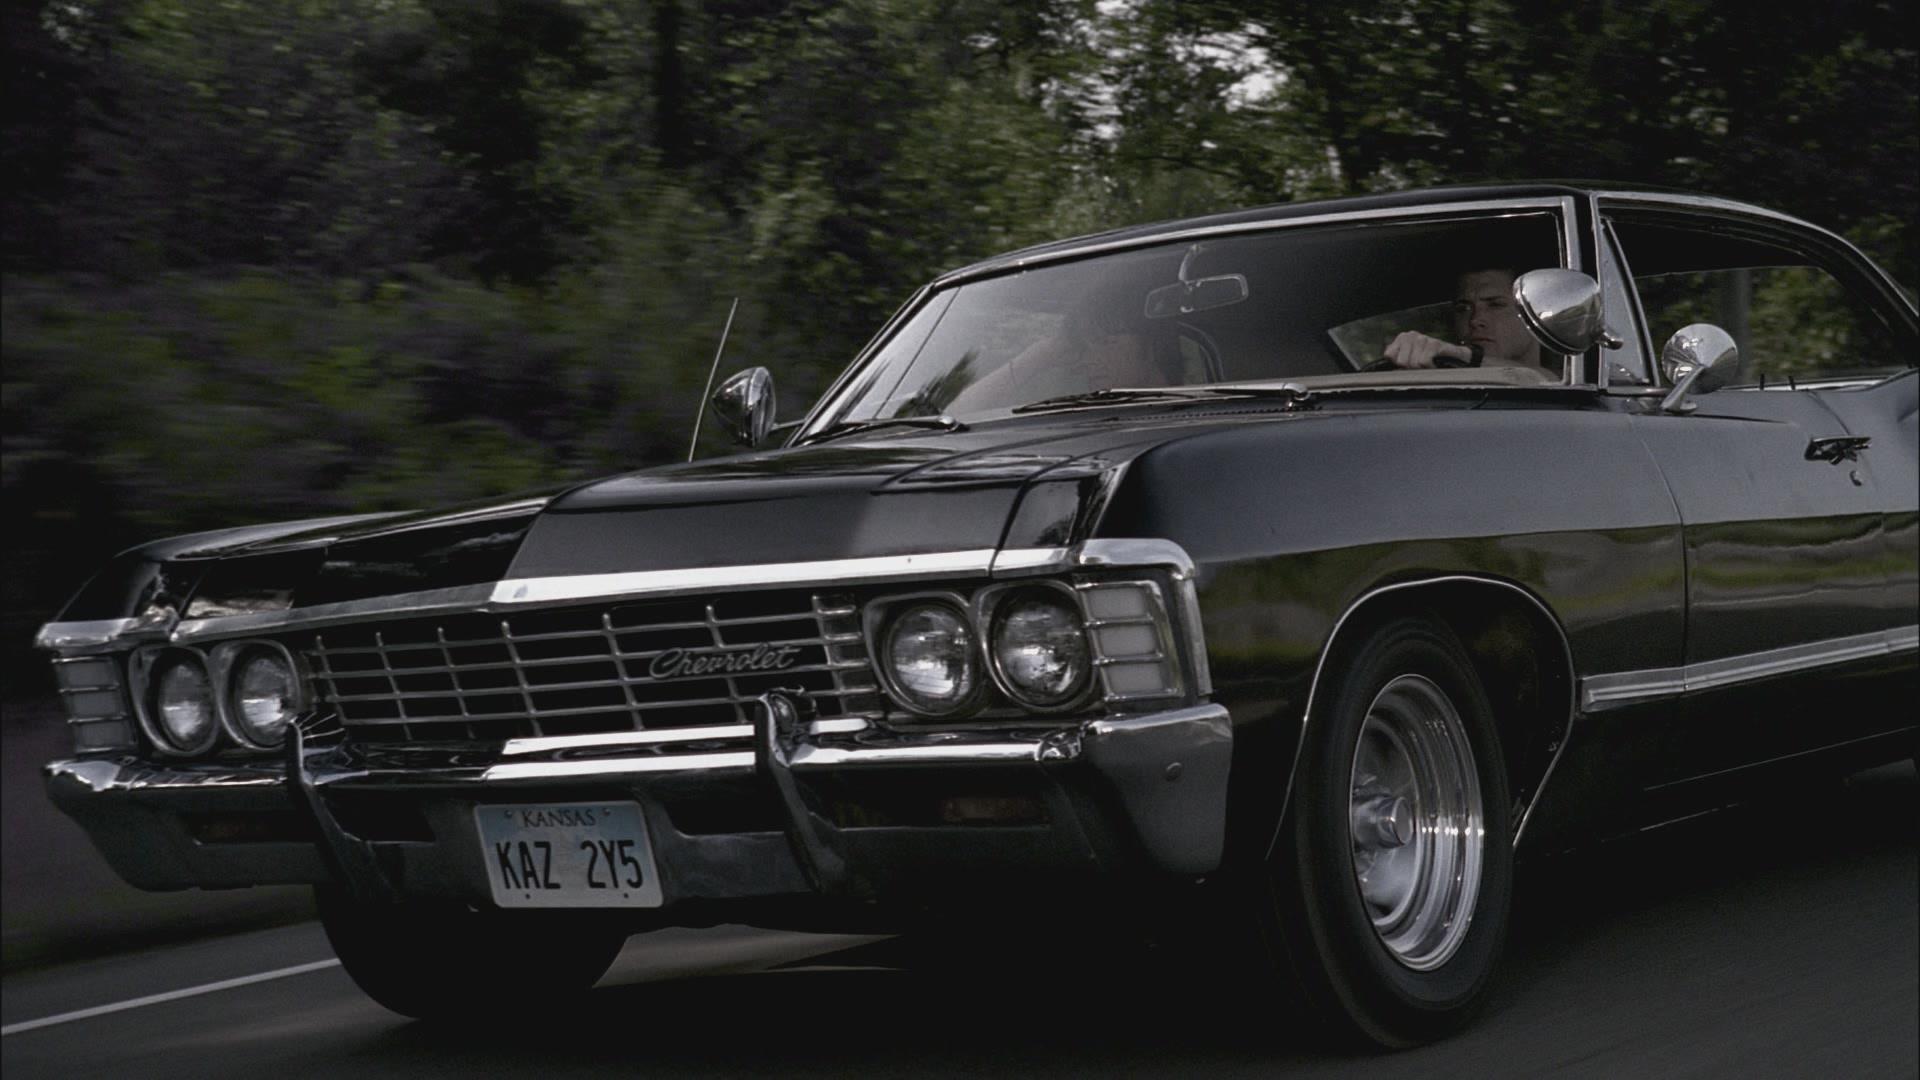 Baby (1967 Chevy Impala)